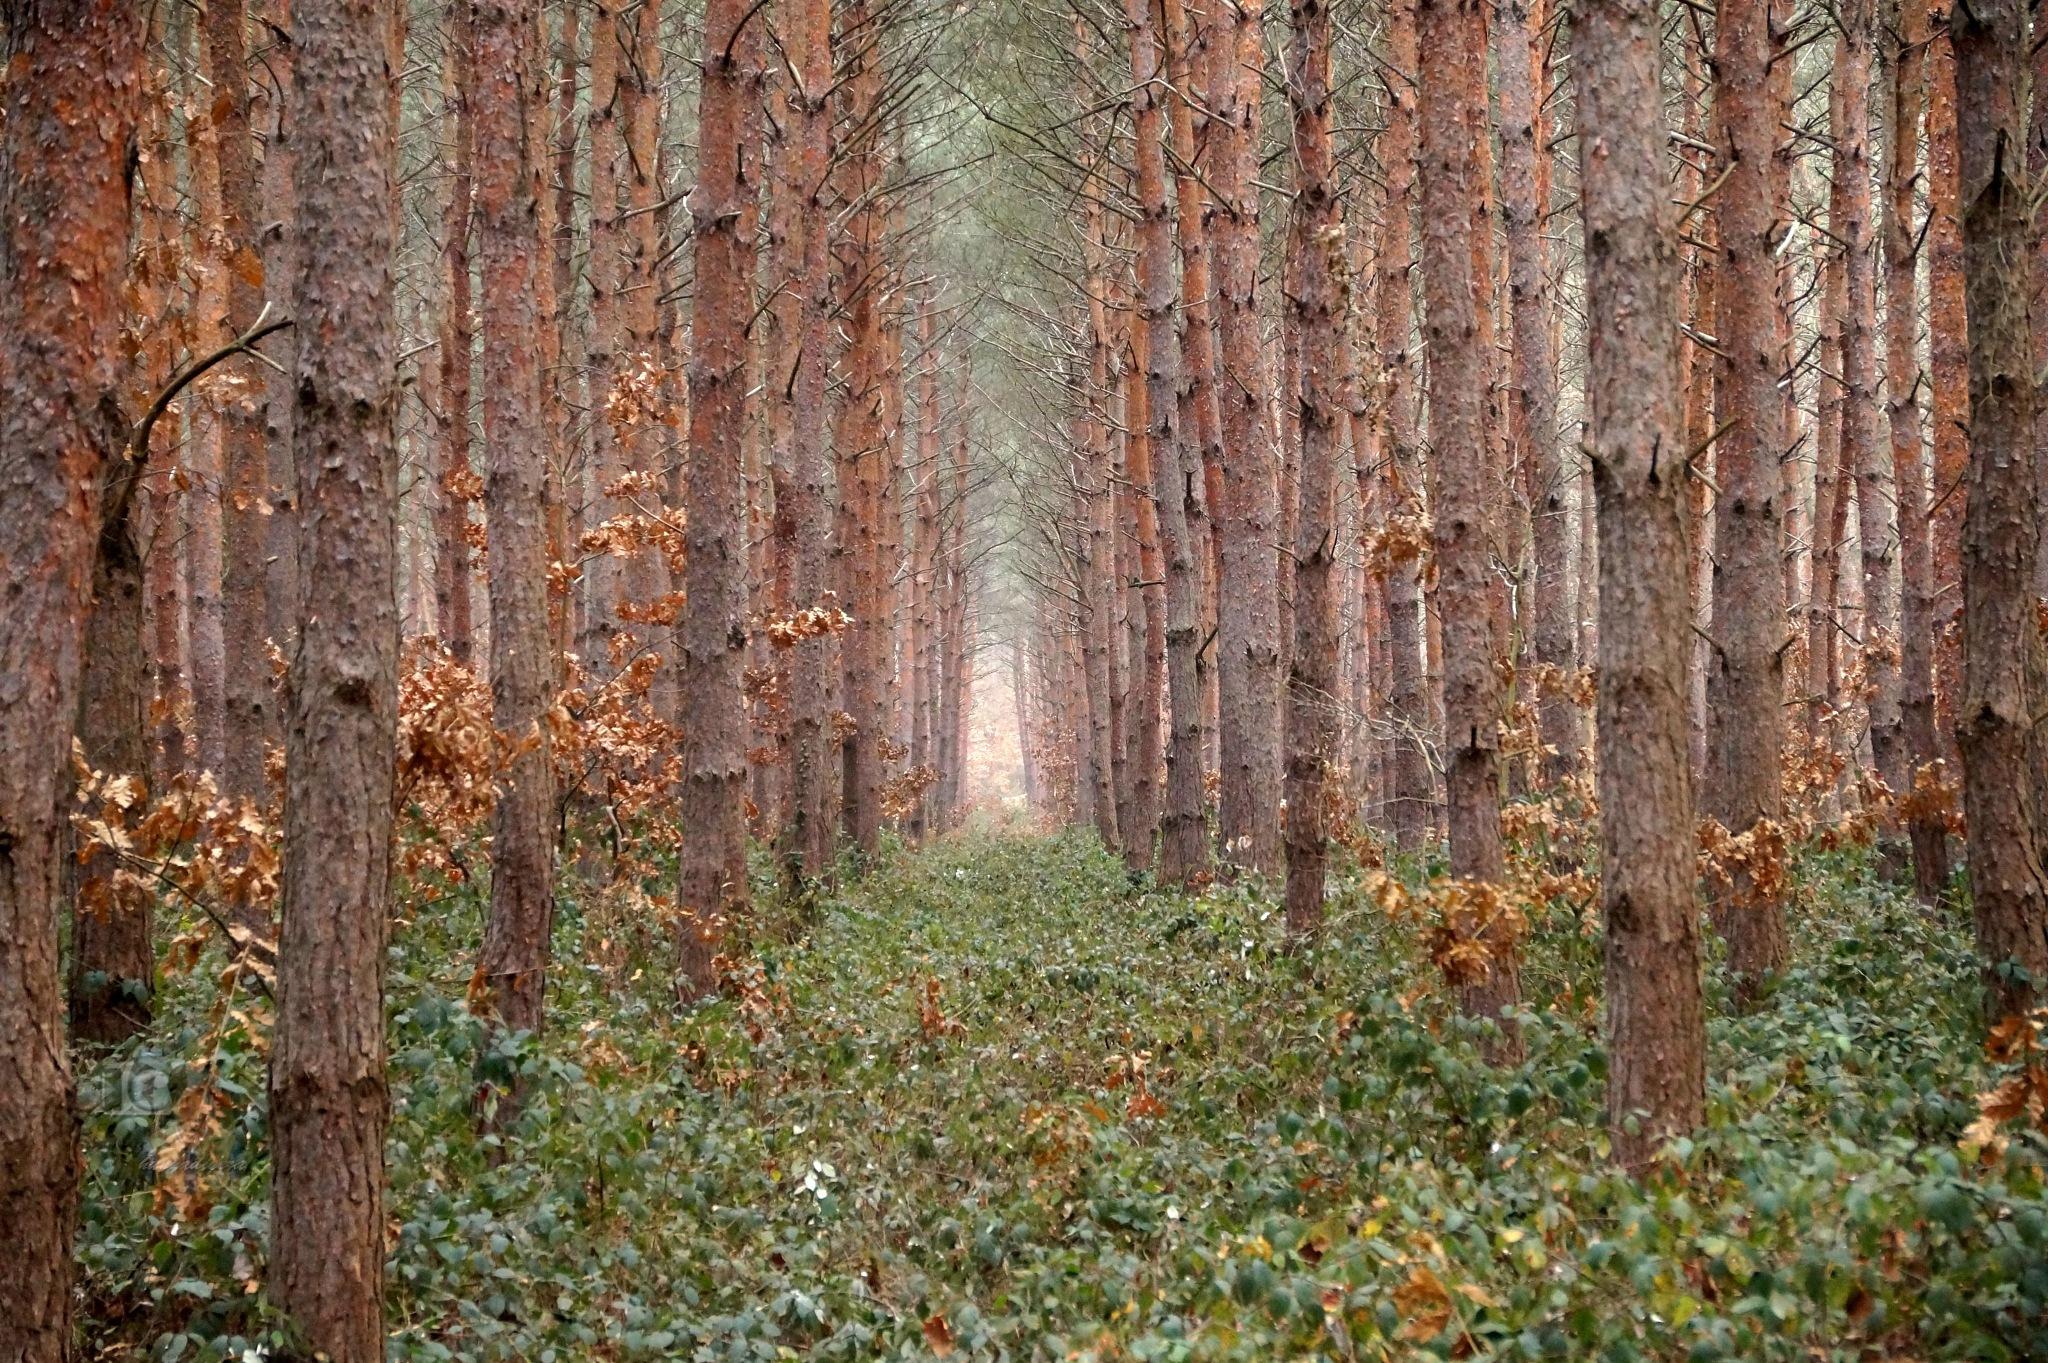 Dec.23, pine forest by hunyadigeza